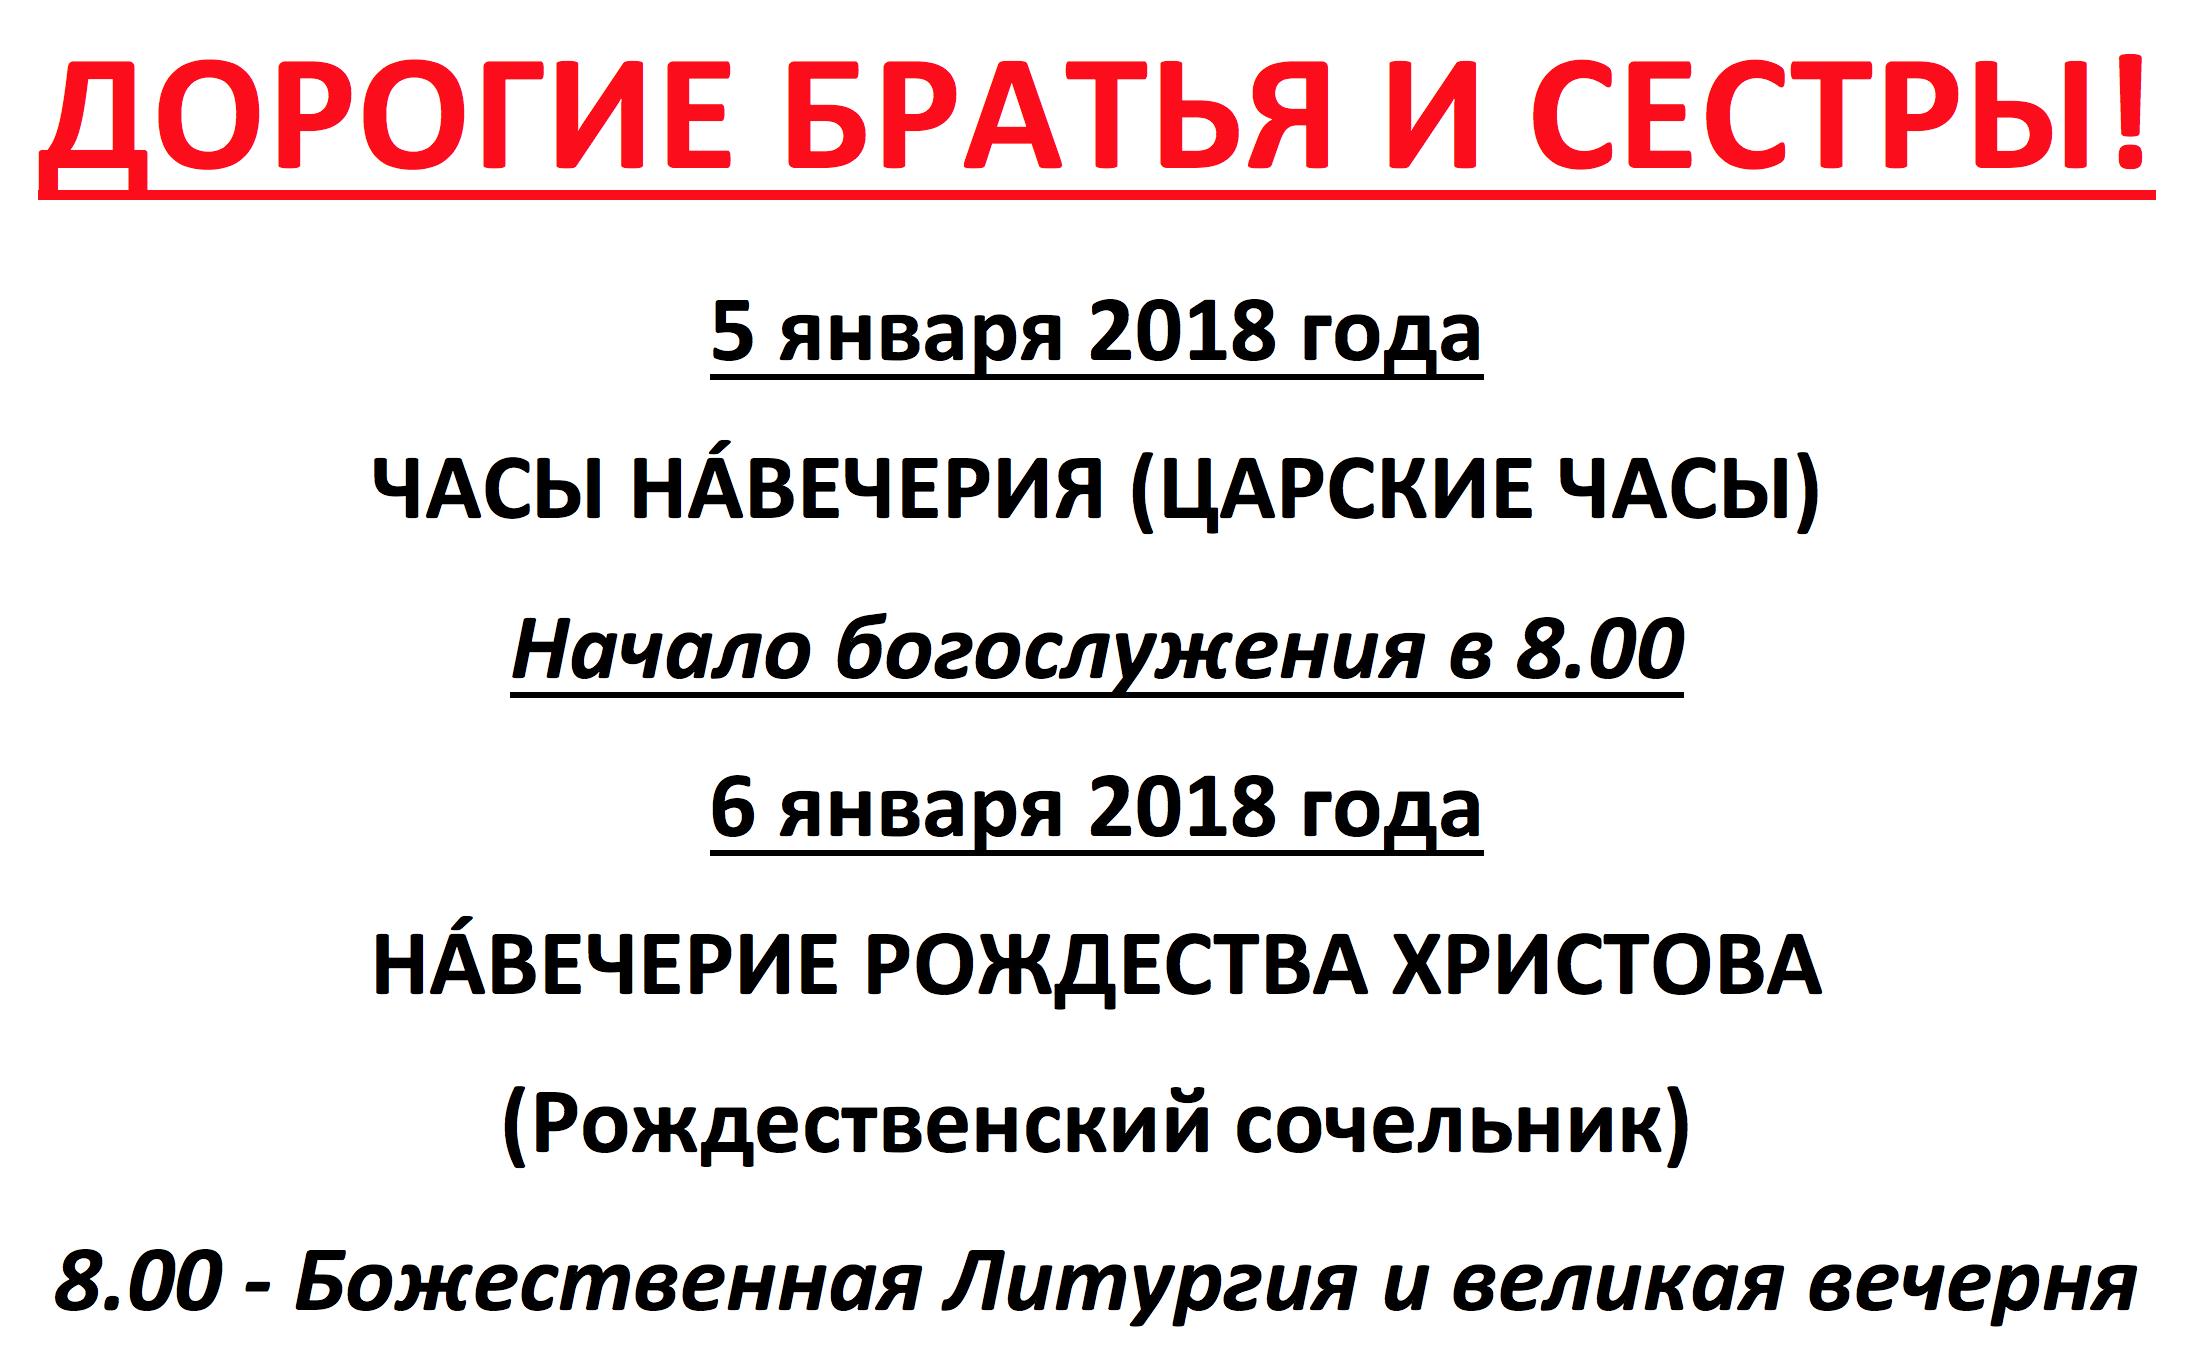 snimok_ekrana_2017-12-24_v_0.24.31.png